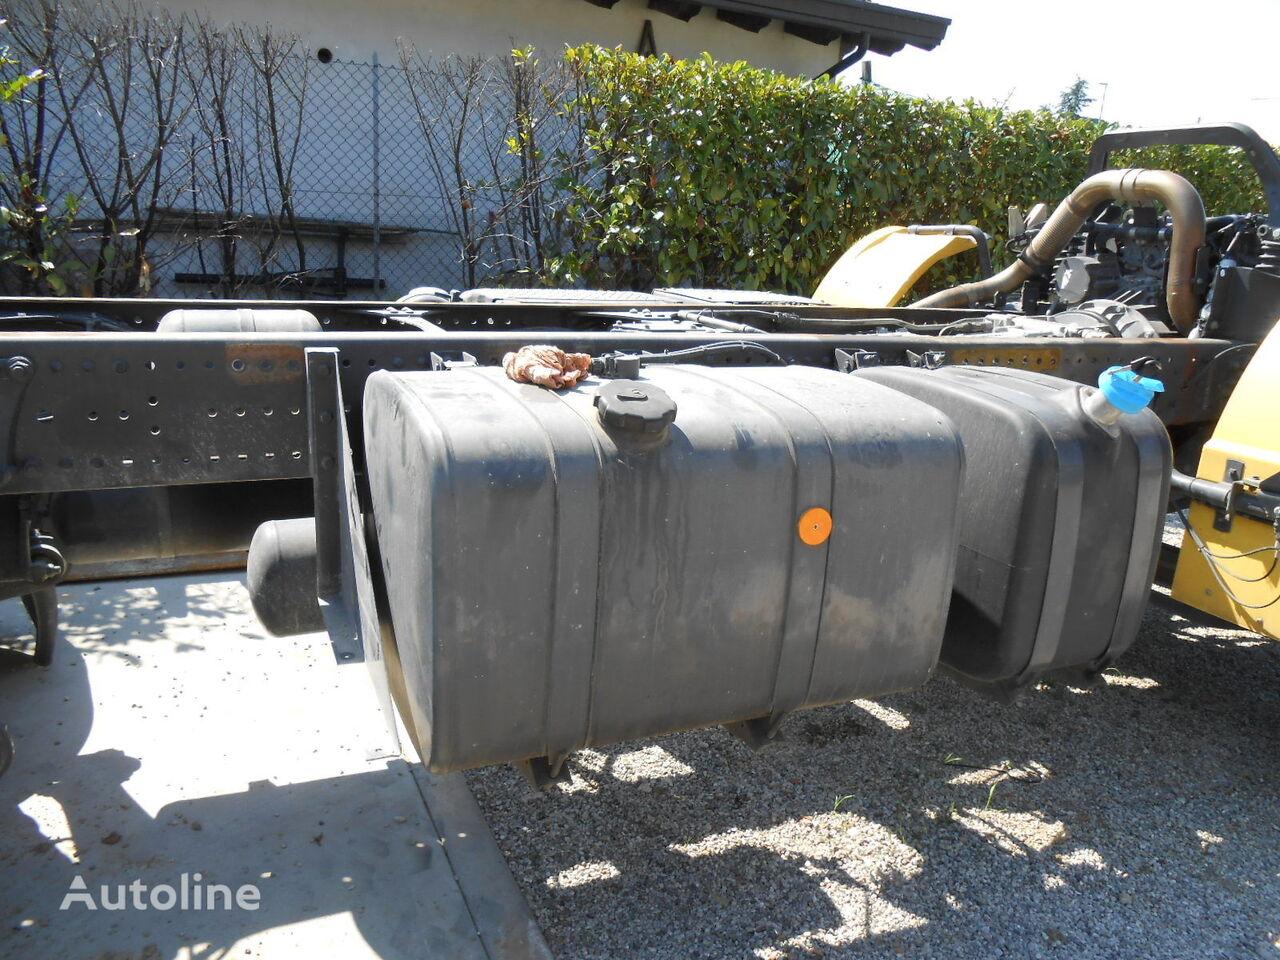 MERCEDES-BENZ ADBLUE TANK AXOR 1833 BLUETEC AdBlue tank for MERCEDES-BENZ AXOR 1833 BLUETEC  4x2 18 t. truck